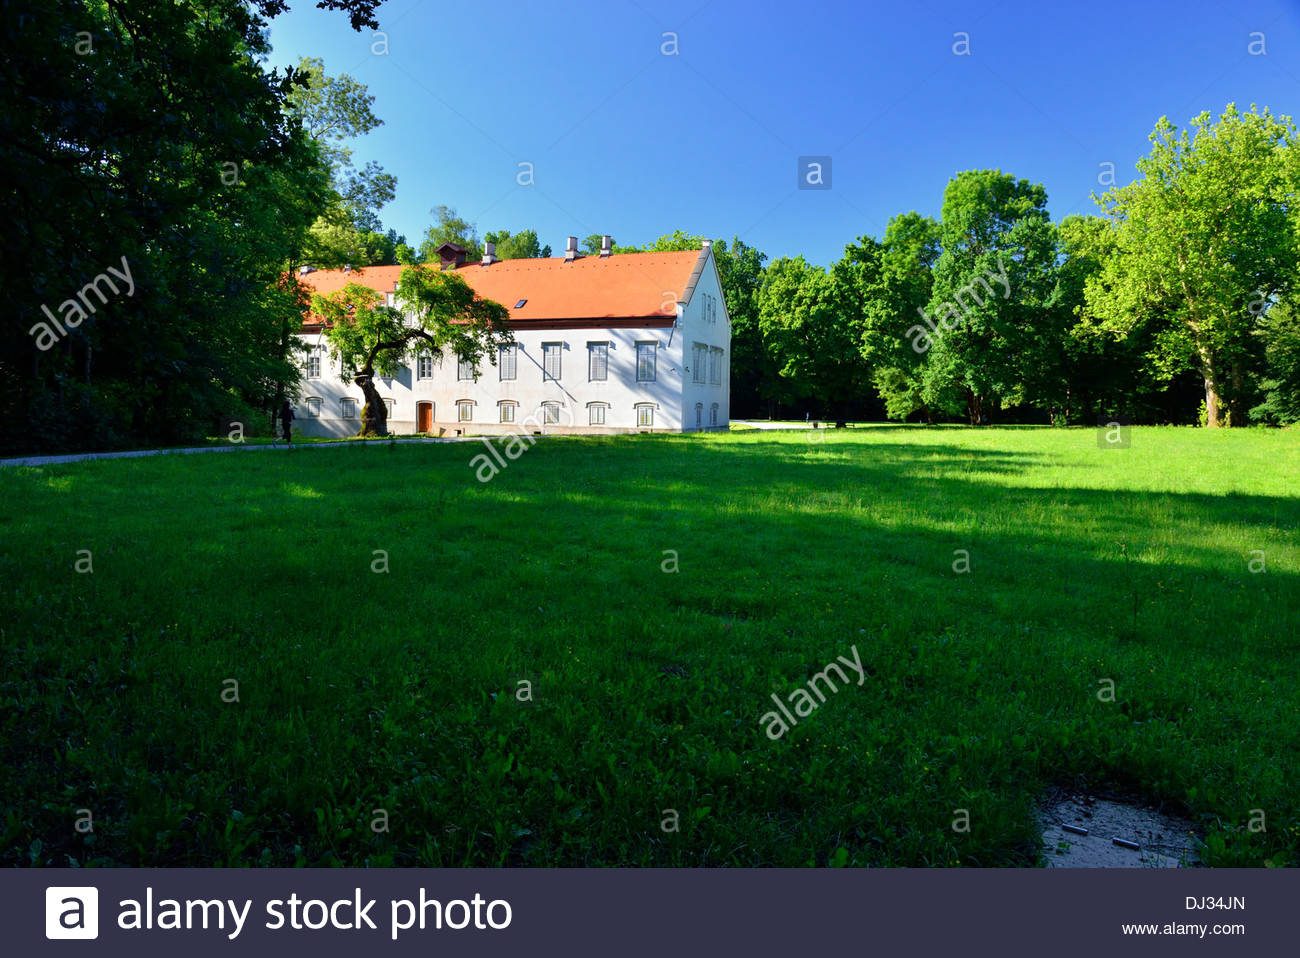 ban Josip Jelacic castle Novi dvori in Zapresic, Croatia Stock Photo